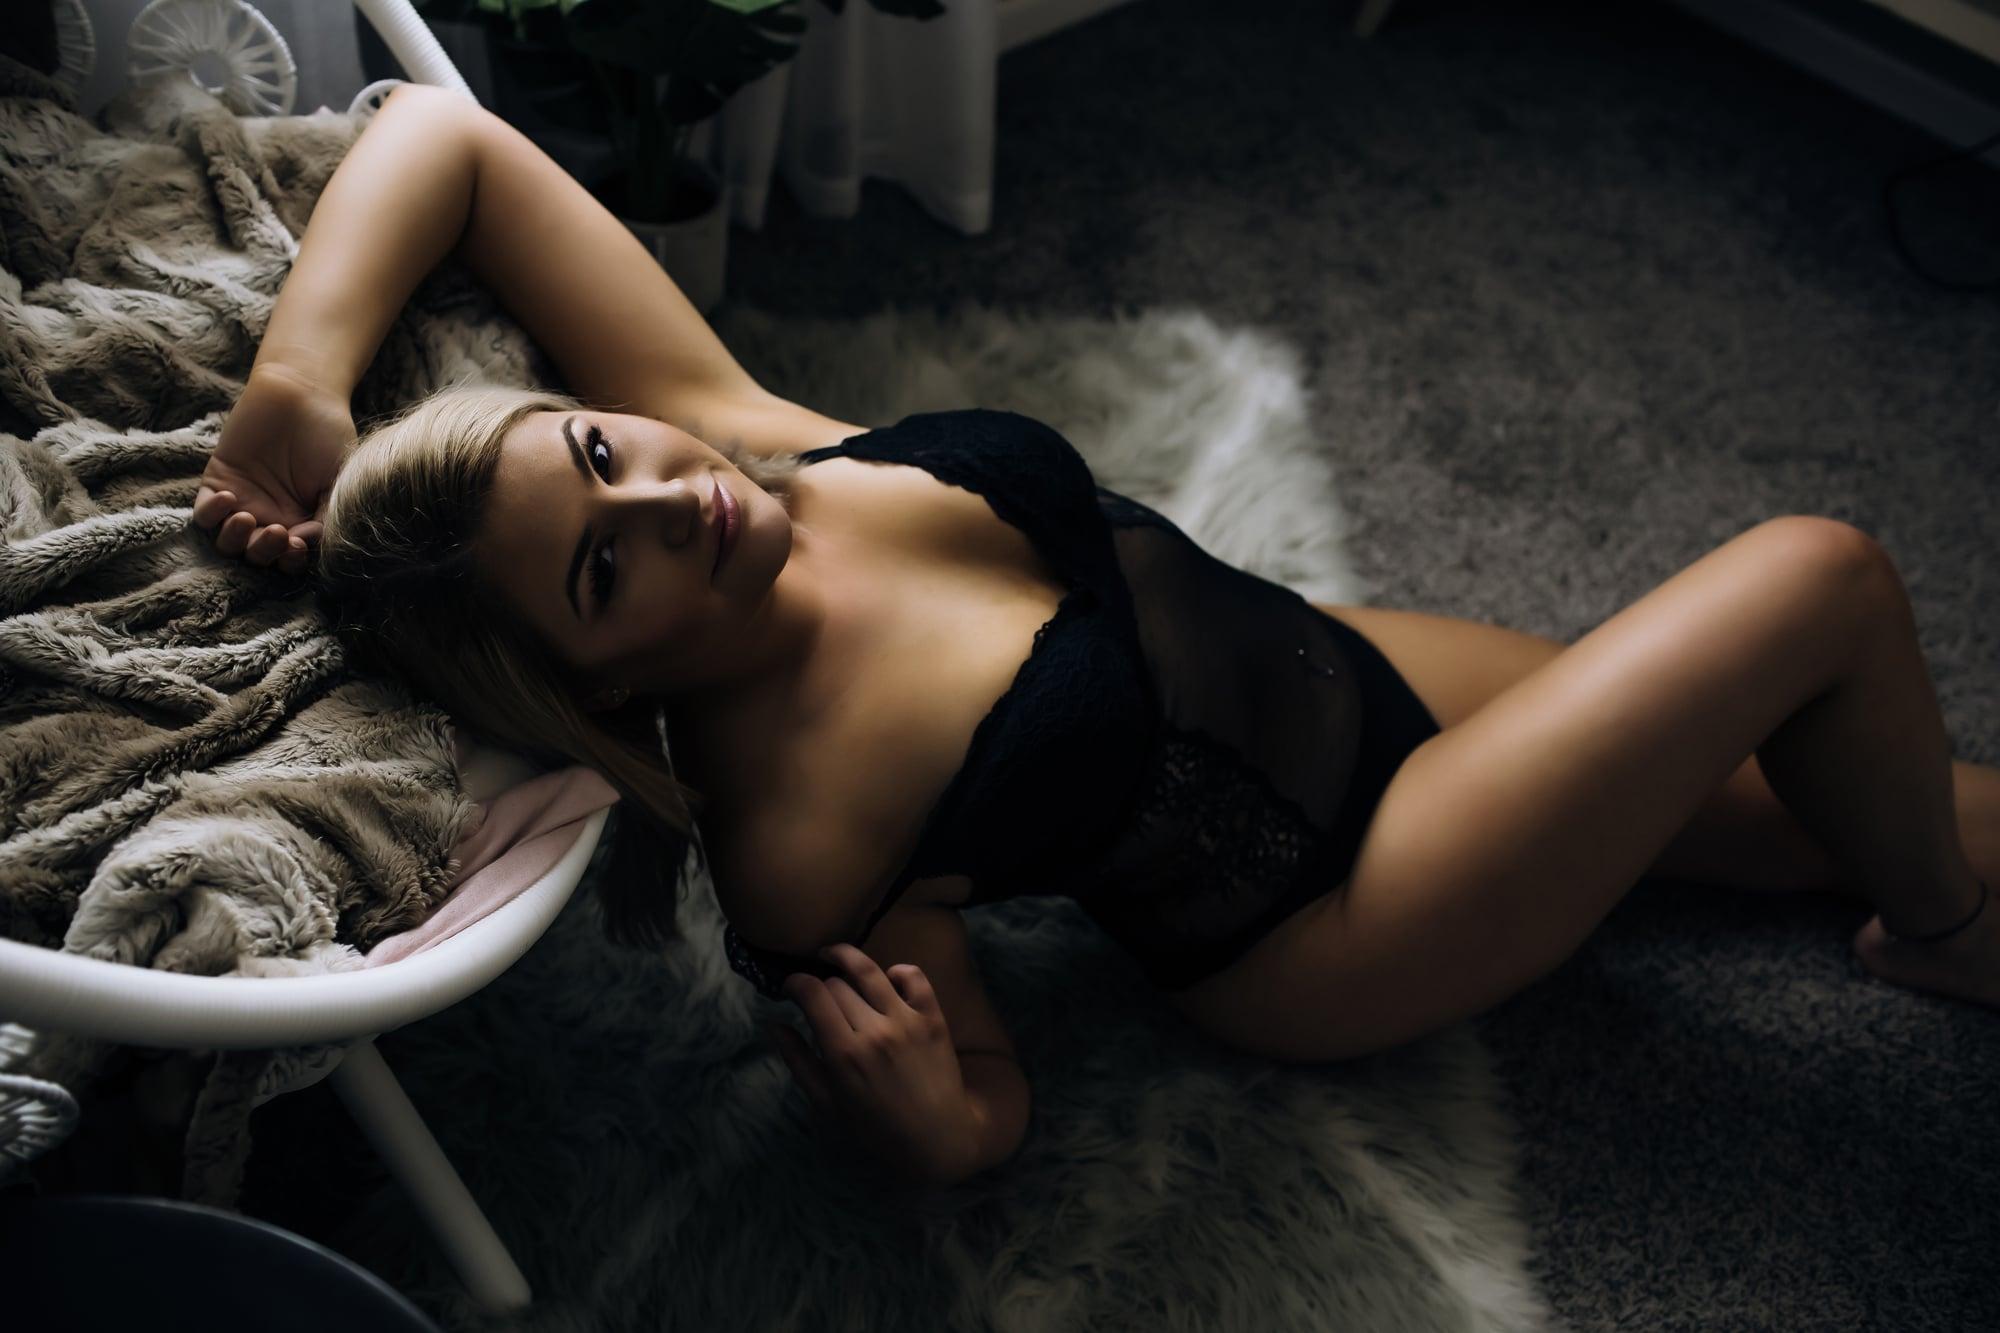 woman-in-black-bodysuit-staring-into-camera